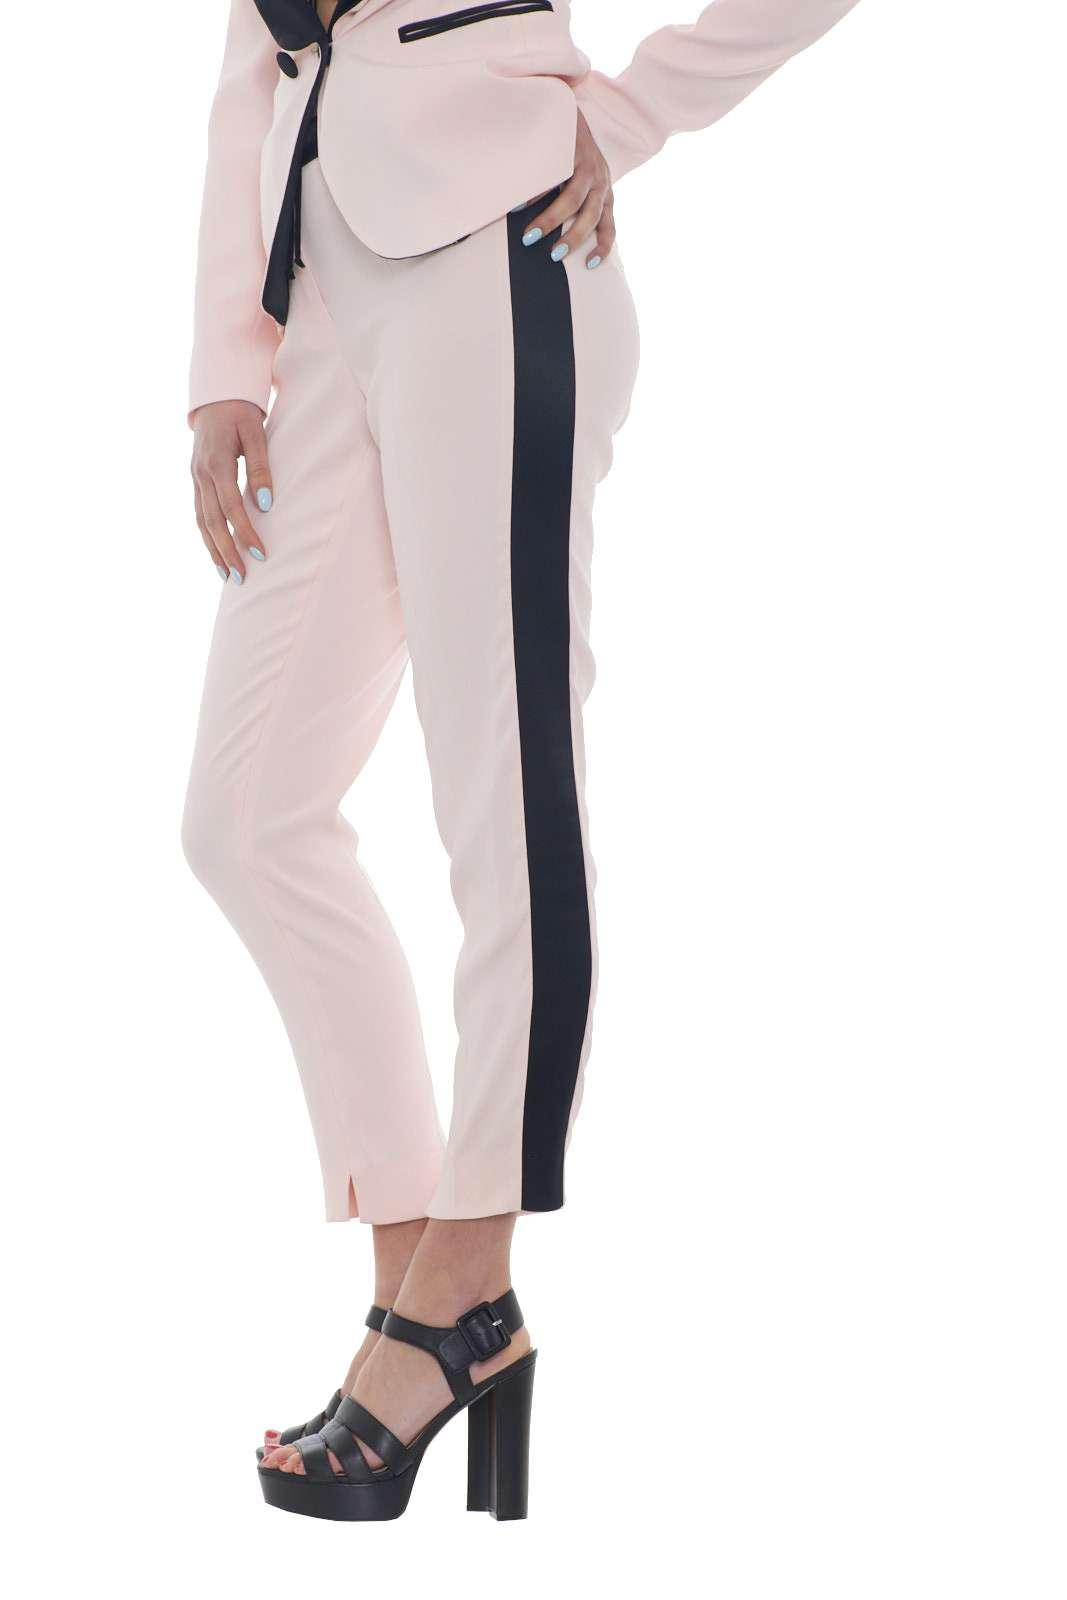 https://www.parmax.com/media/catalog/product/a/i/PE-outlet_parmax-pantaloni-donna-Liu-Jo-i18076-B.jpg